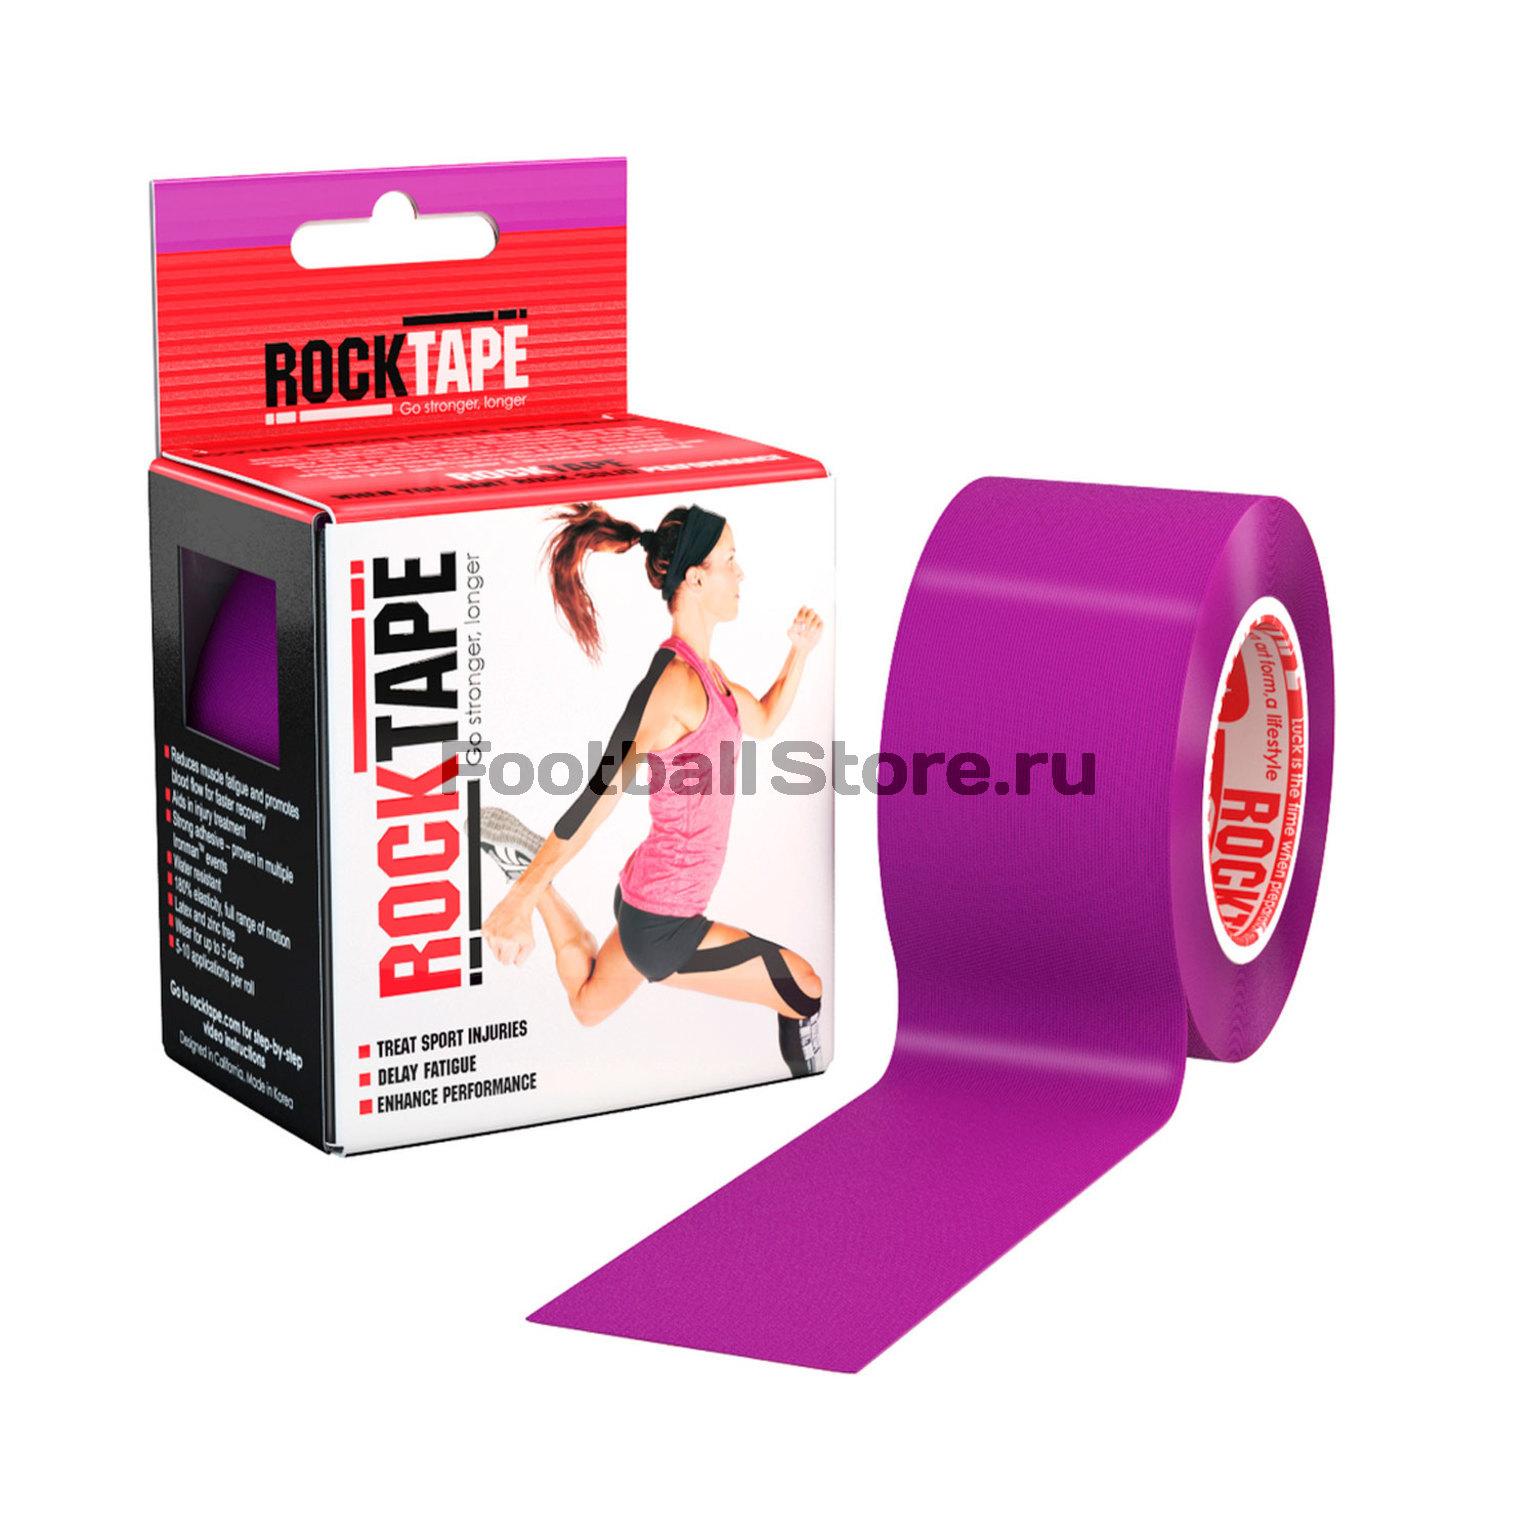 Медицина Rocktape ТЕЙП Rocktape, classic, фиолетовый, 5см х 5м кинезия тейп в аптеке